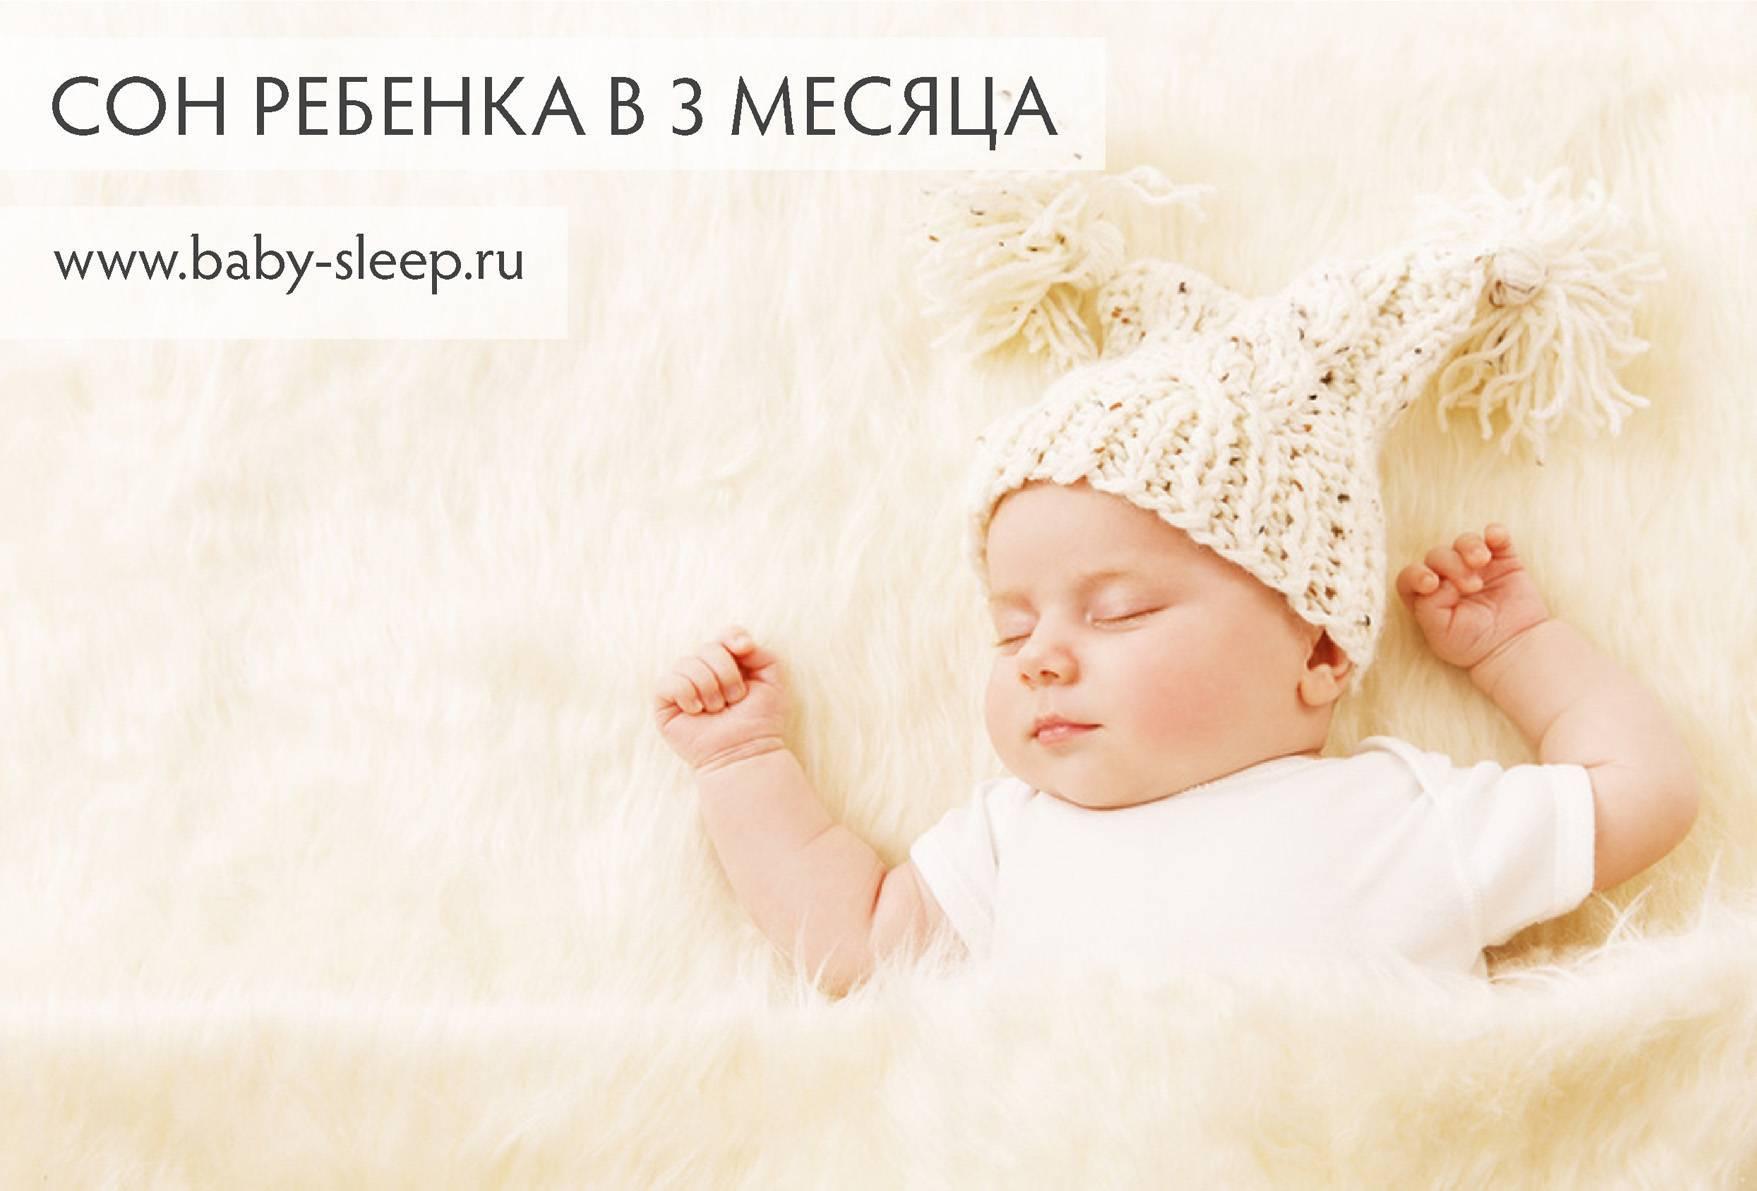 Как уложить ребенка спать без укачиваний на руках?